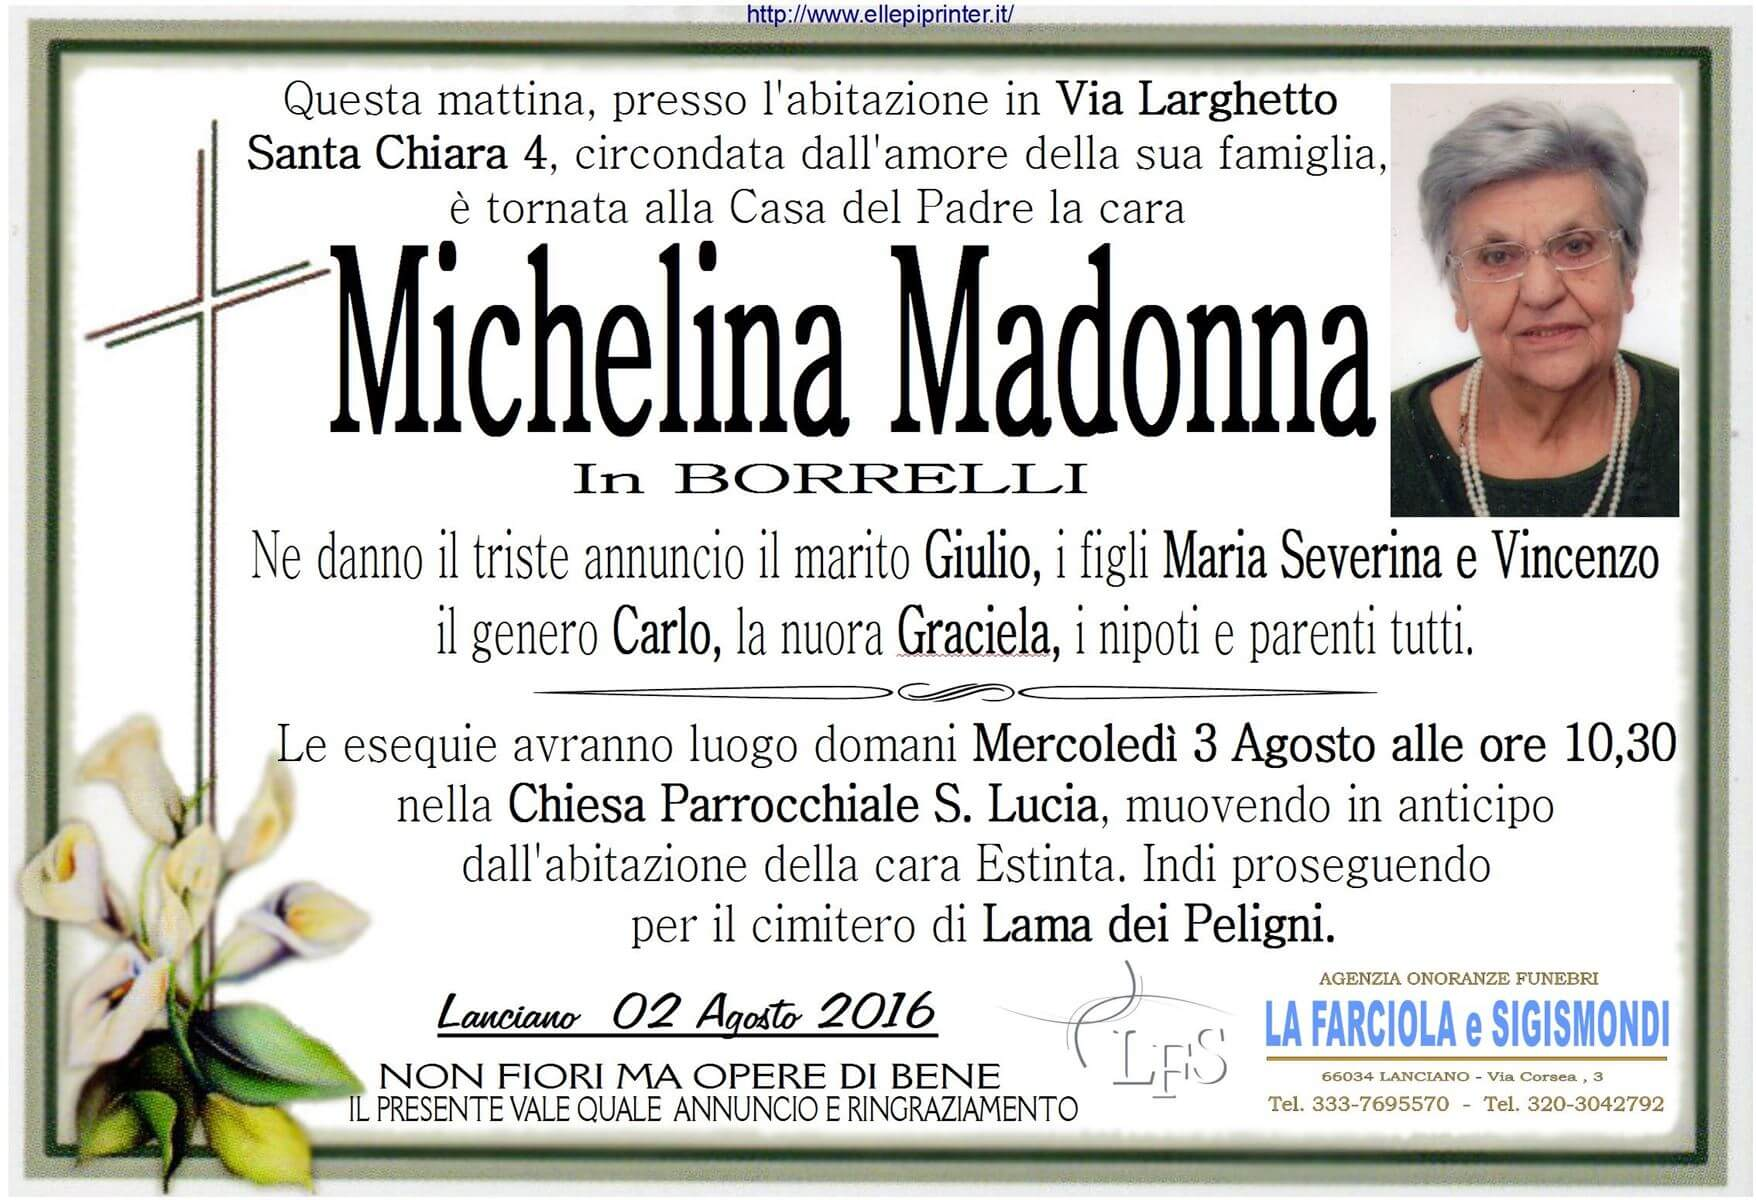 MANIFESTO MADONNA MICHELINA